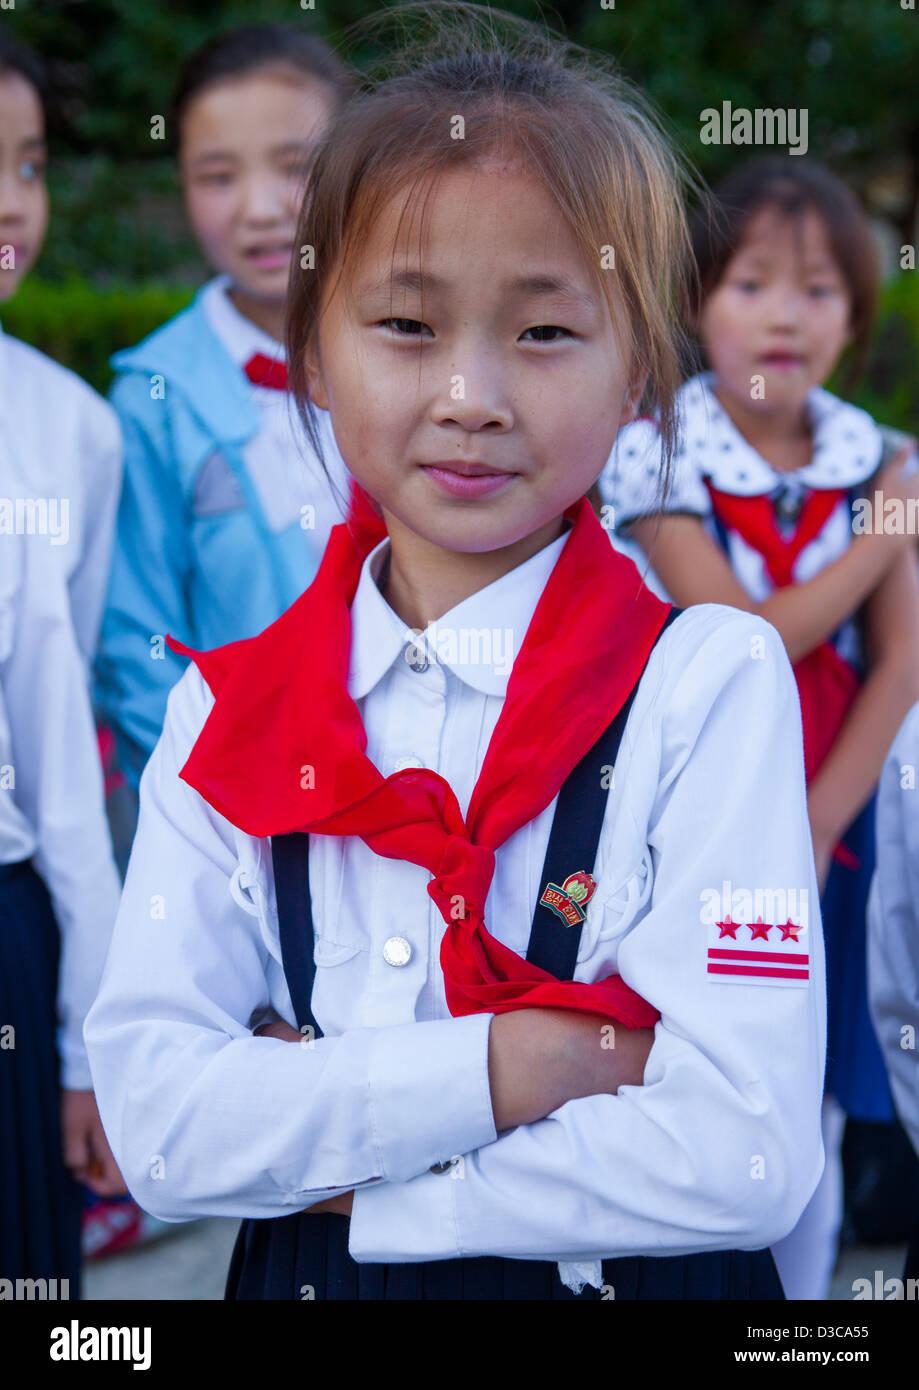 Pioneer Girl At Songdowon International Children's Camp, Wonsan, North Korea, North Korea - Stock Image